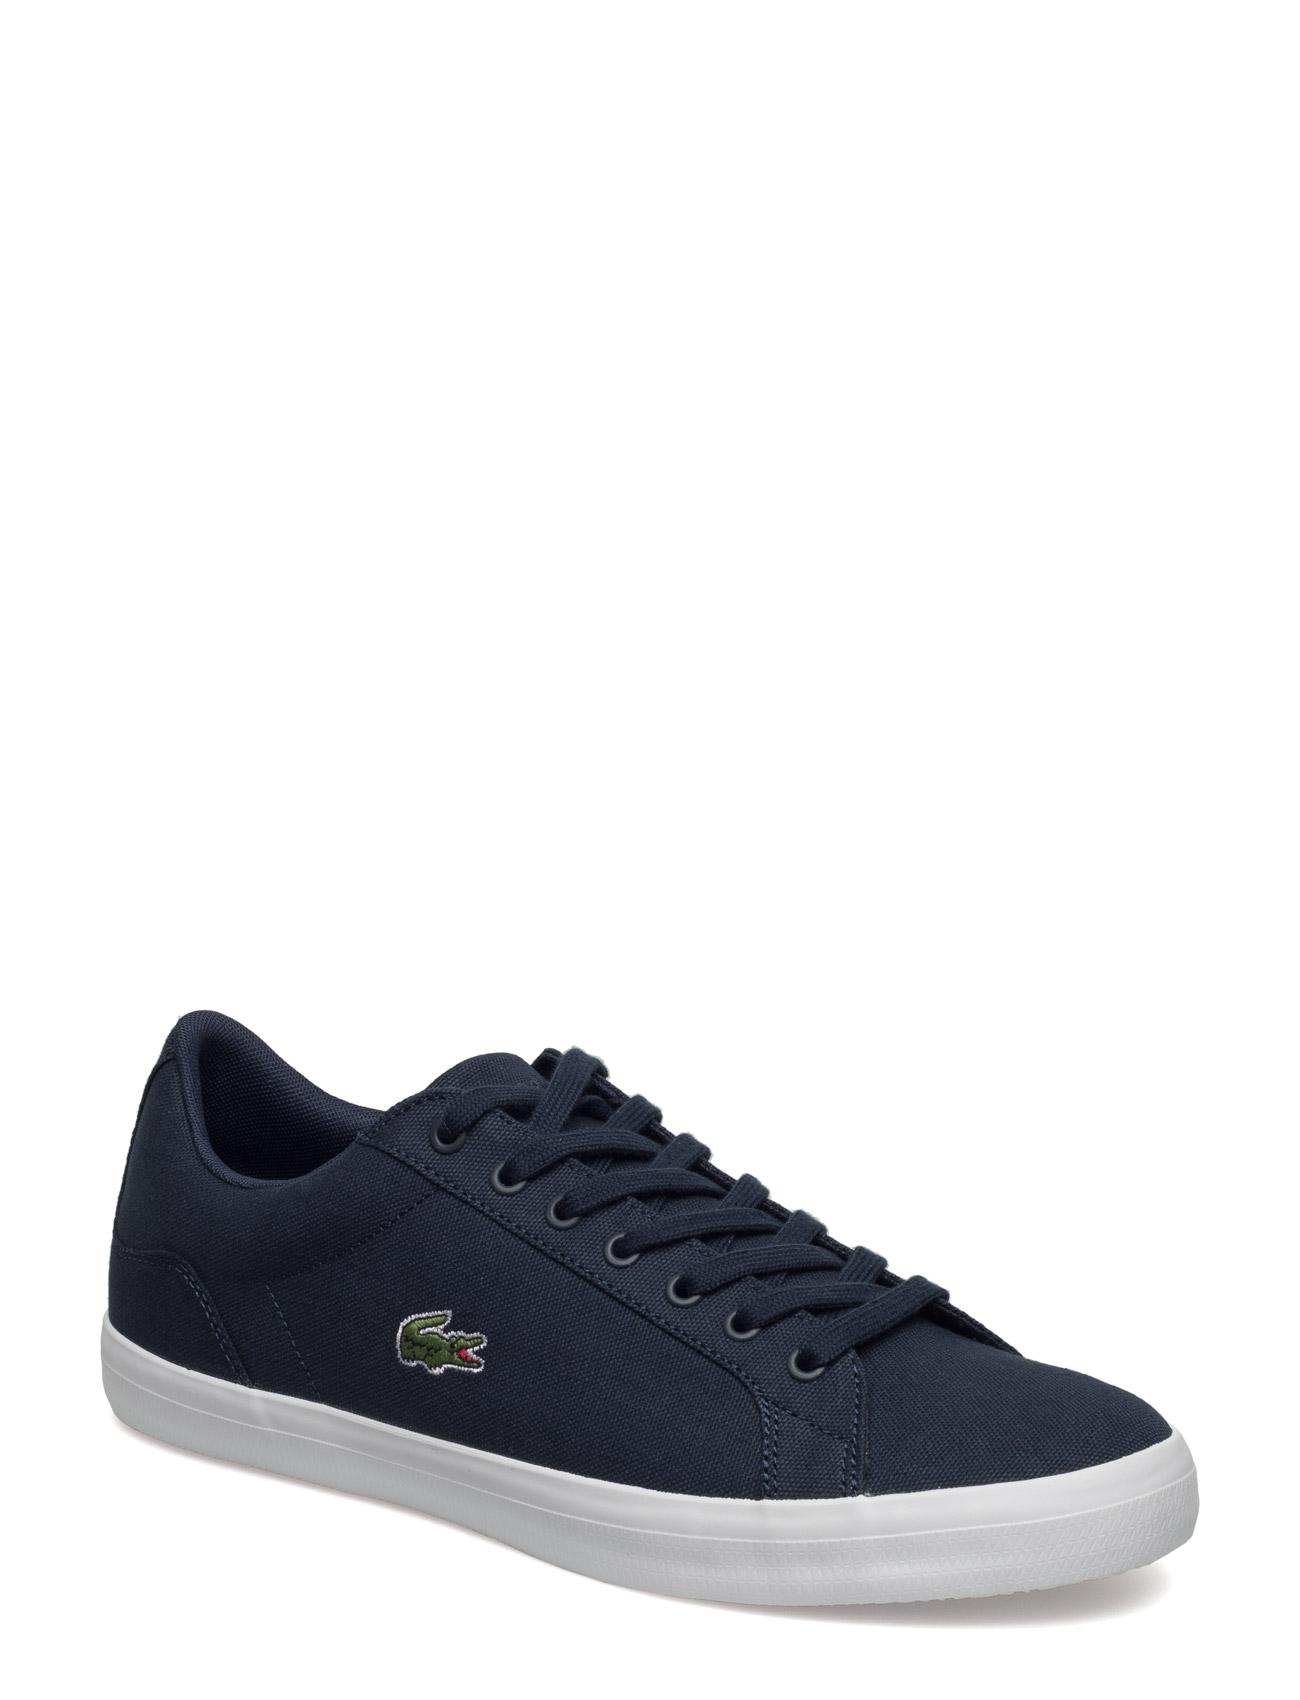 lacoste shoes Lerond bl 2 på boozt.com dk